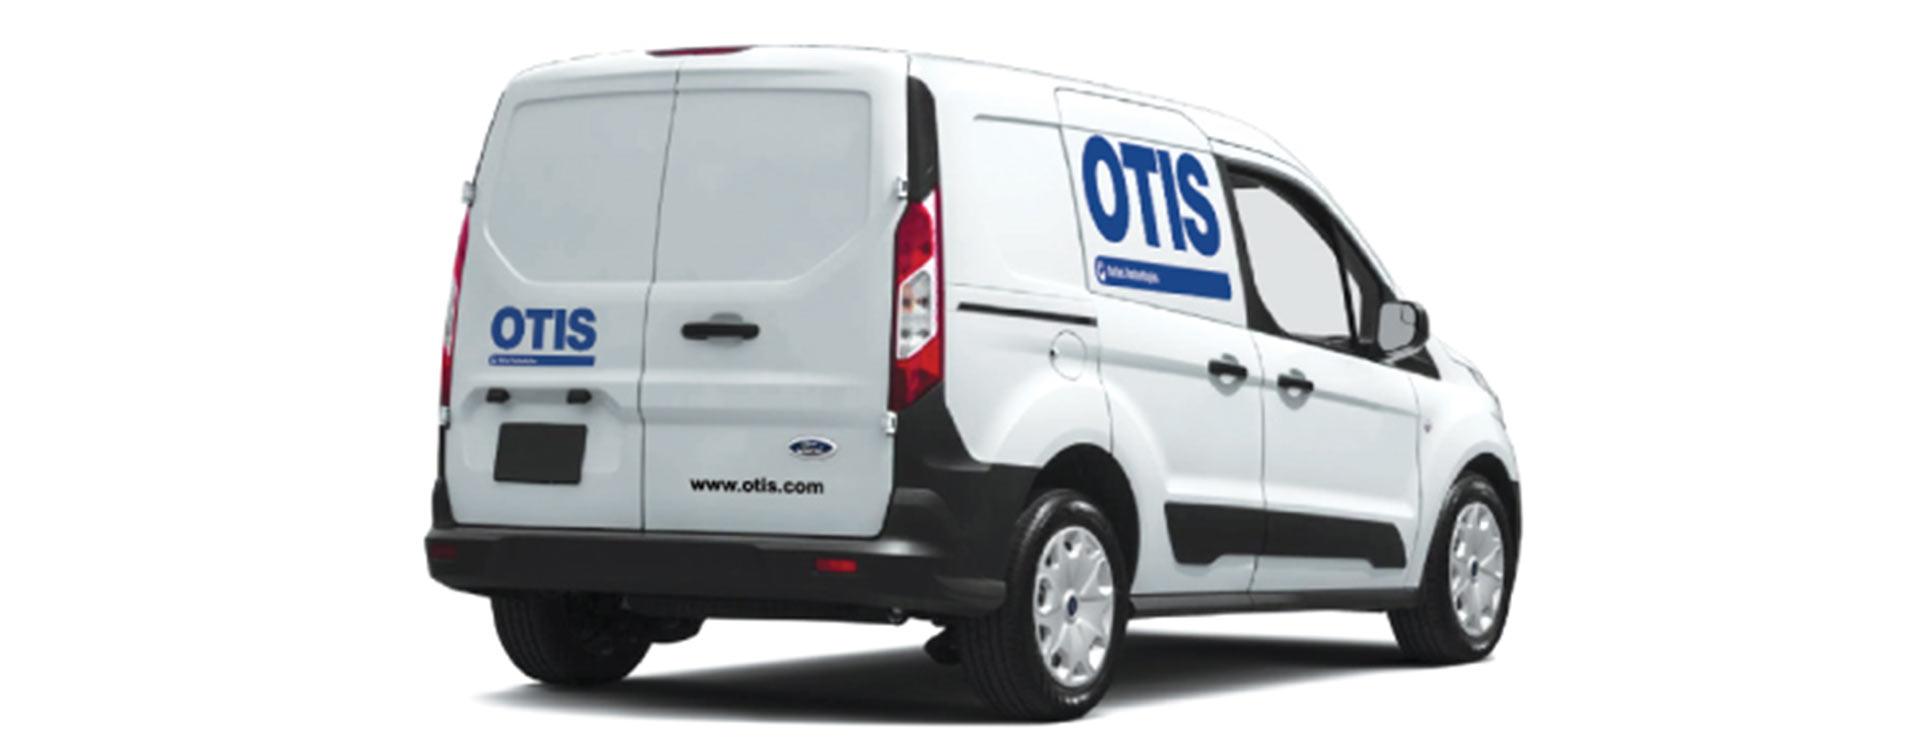 North America Otis Elevator vehicle  and testimonial for Associated Graphics Inc.